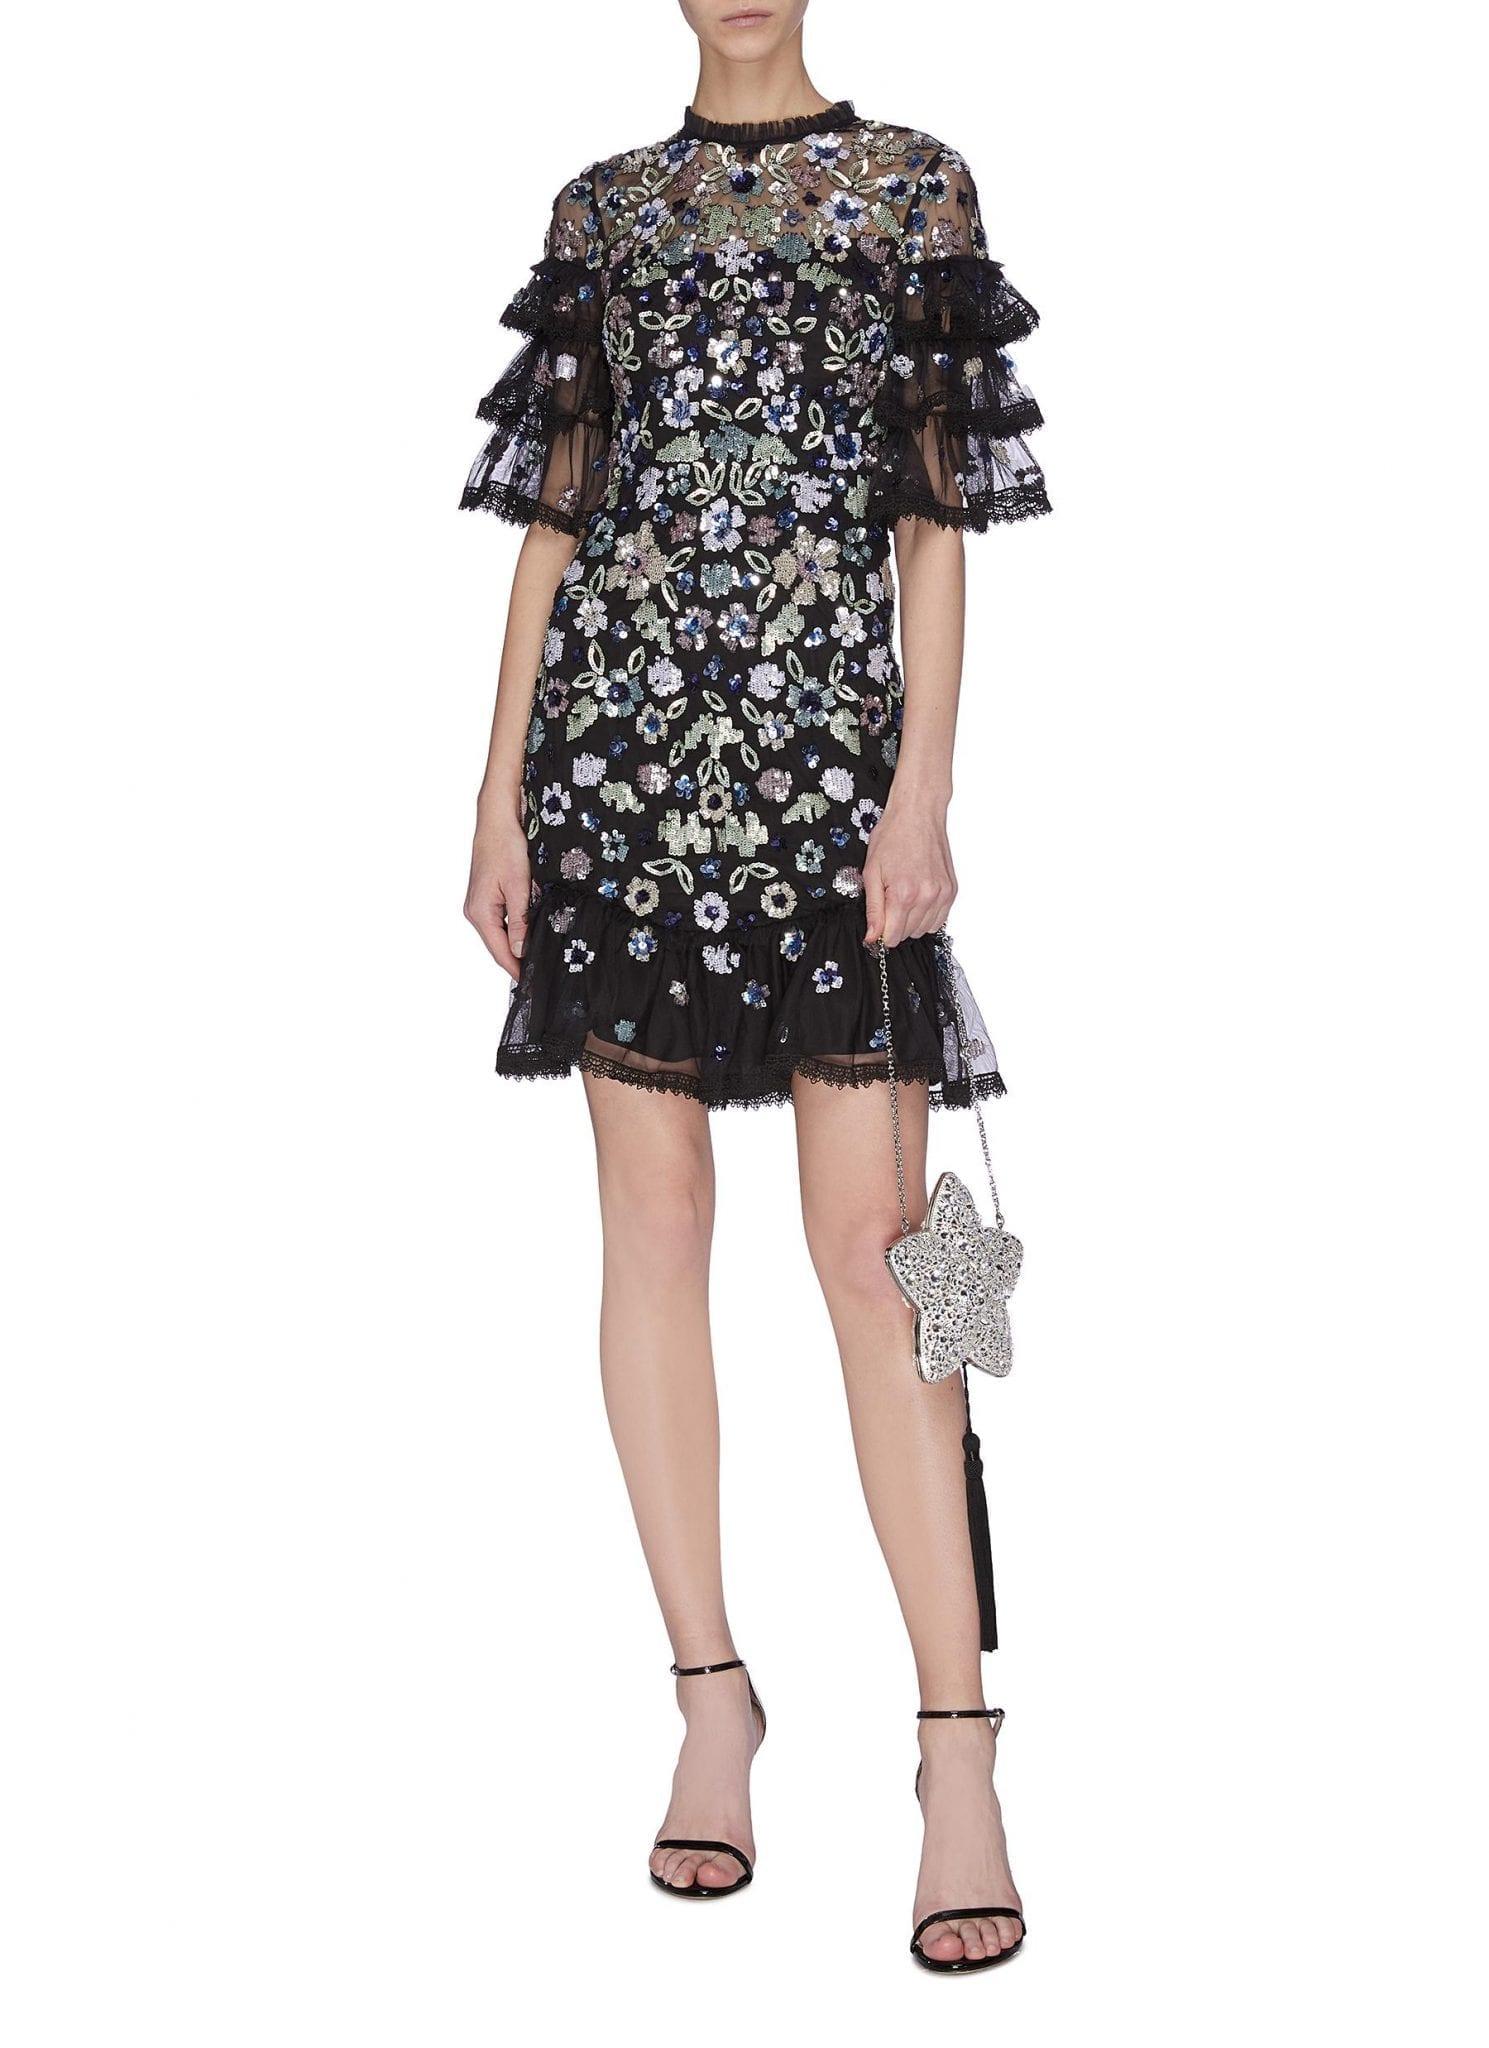 NEEDLE & THREAD 'Meadow' Sequin Embroidered Ruffle Mini Dress